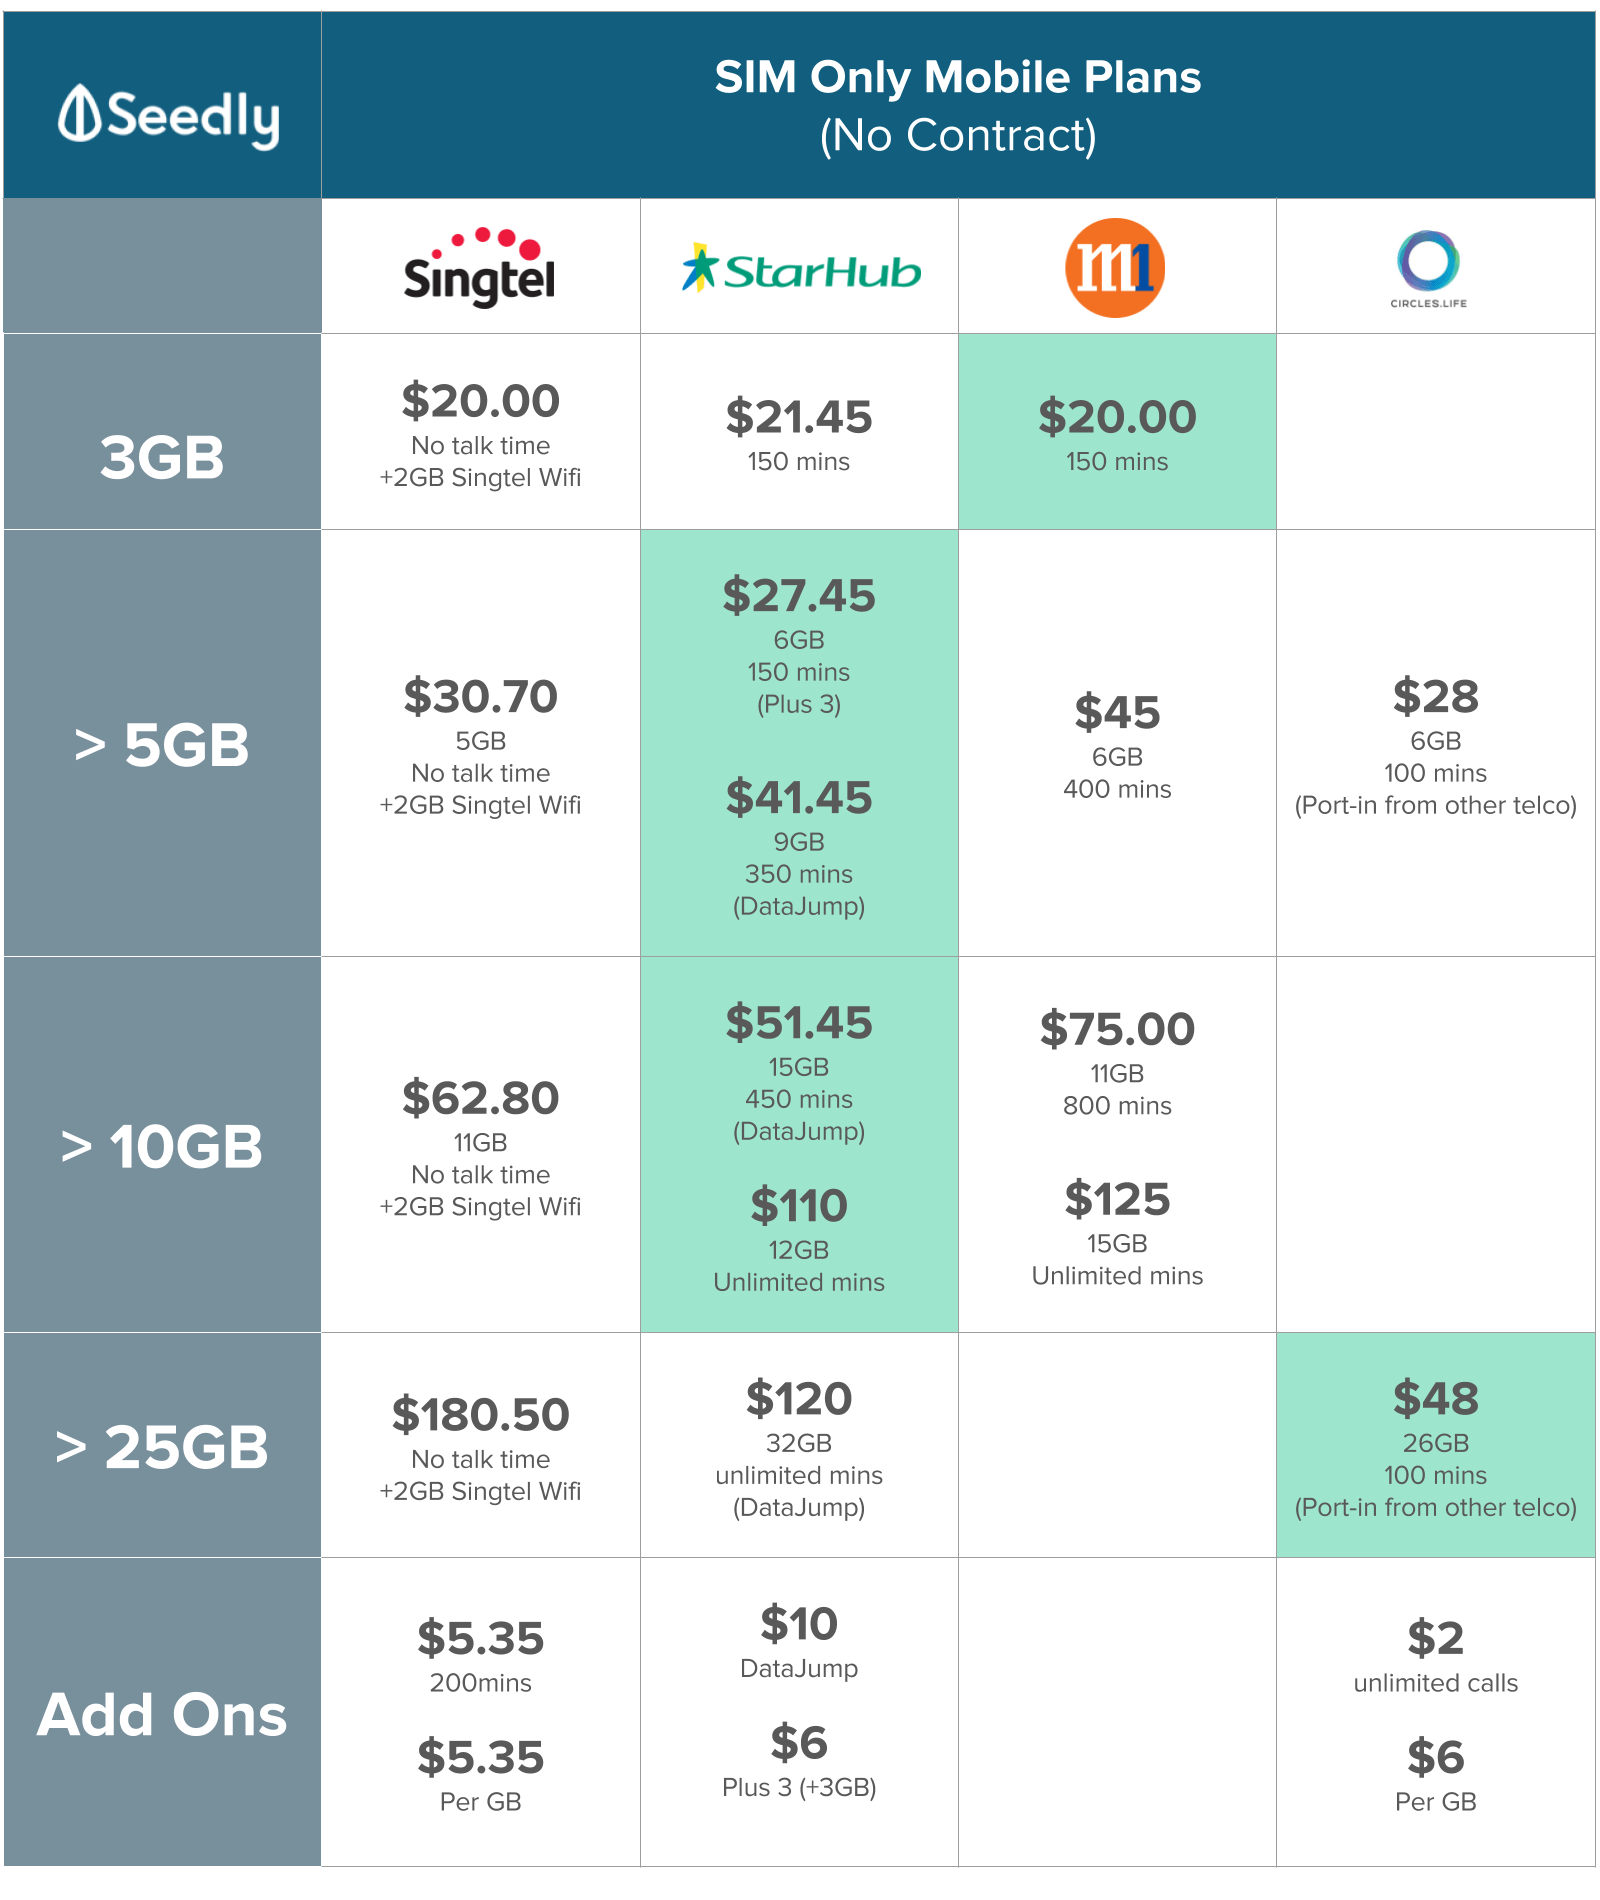 SGinvestors.io ~ Where SG Investors Share